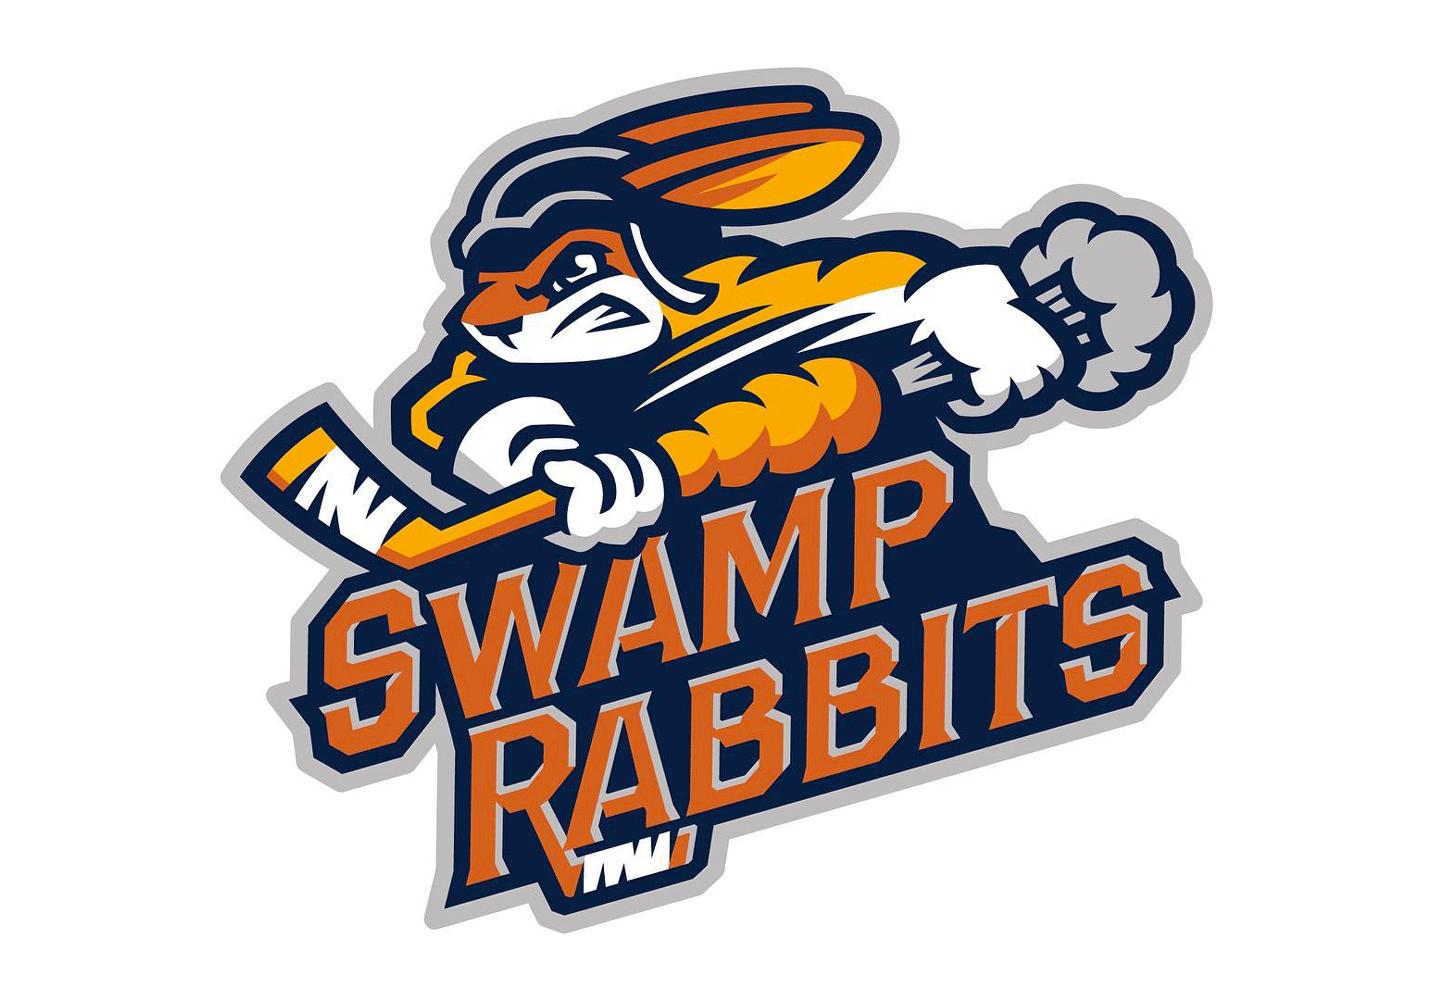 Swamp_rabbits_logo_detail.png